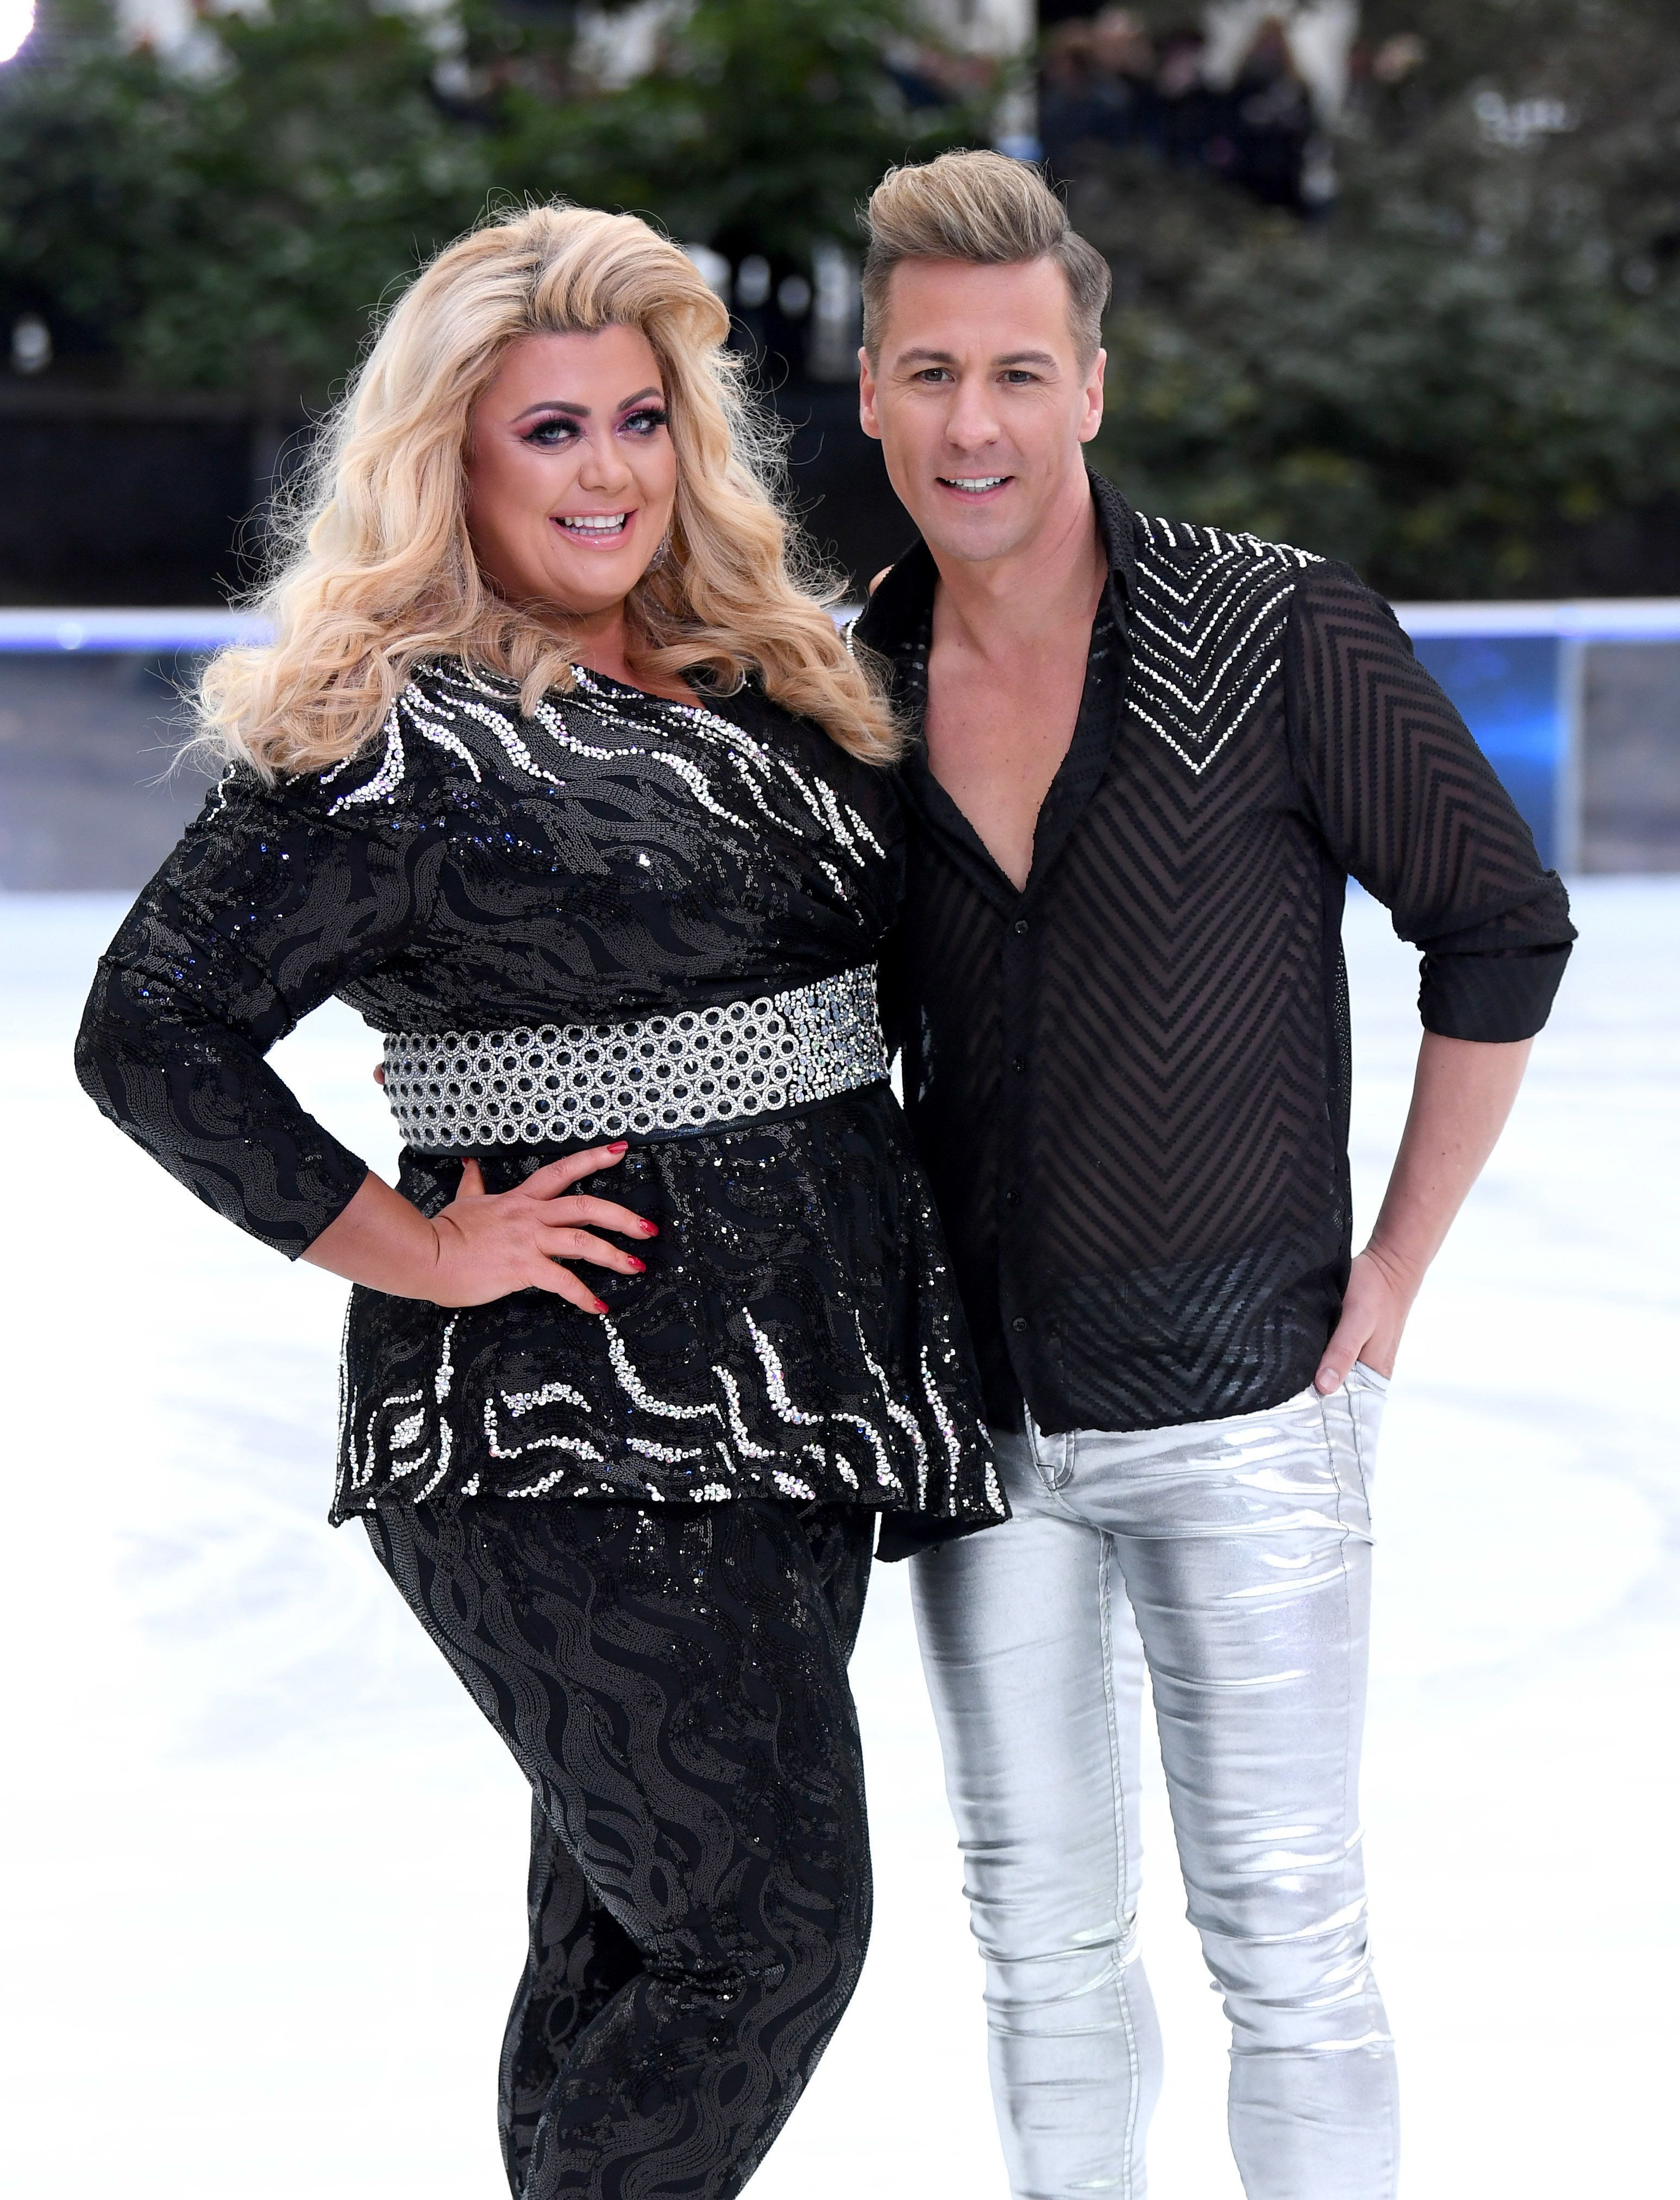 Gemma Collins' 'Dancing On Ice' Partner Matt Evers Teases 'Emotional' Live